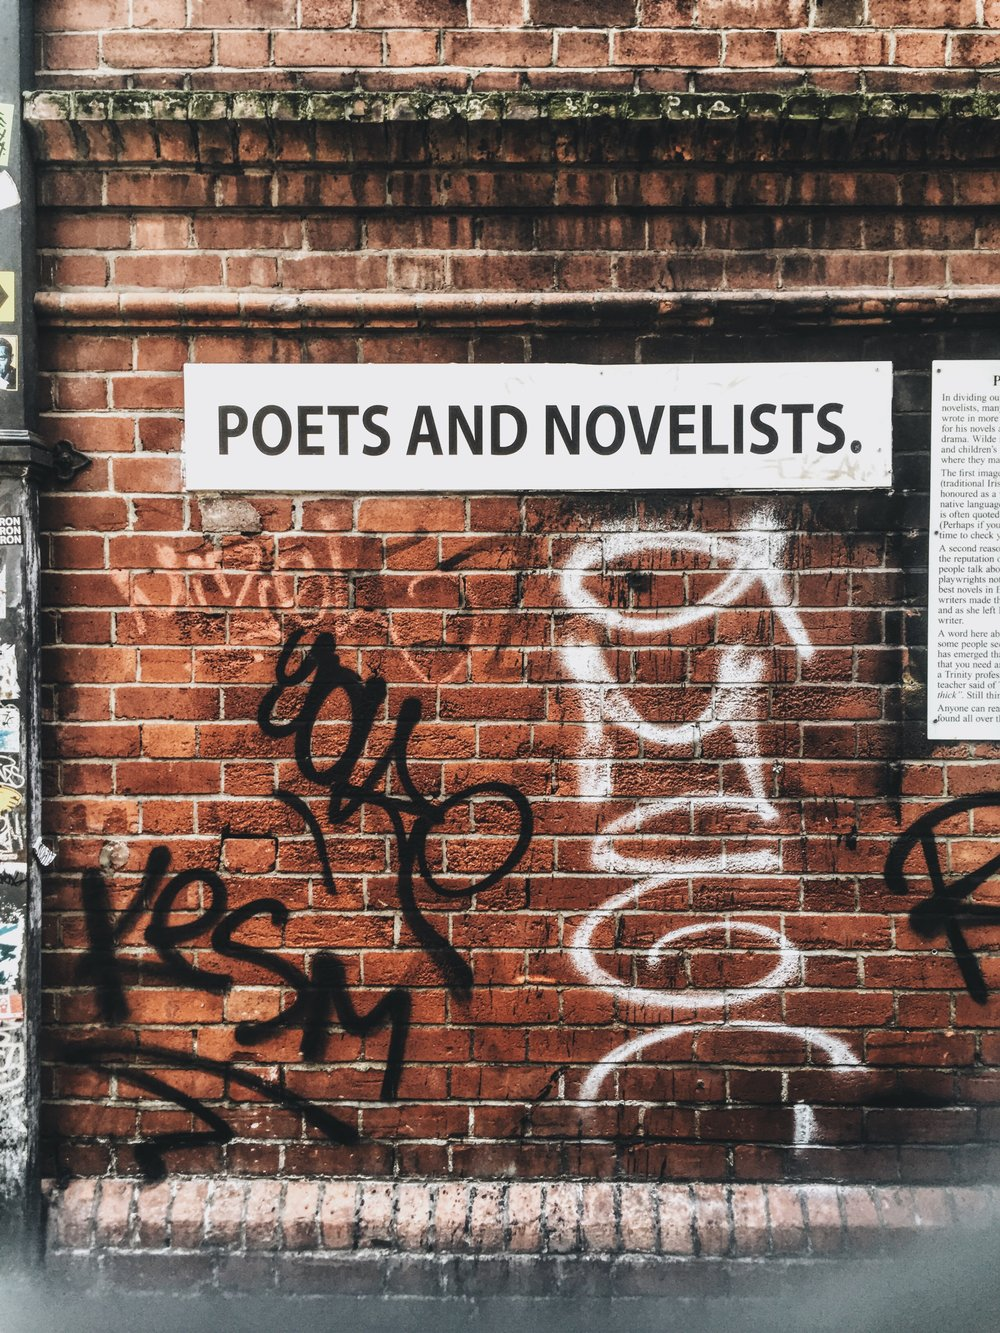 Dublin Street art poets & novelists